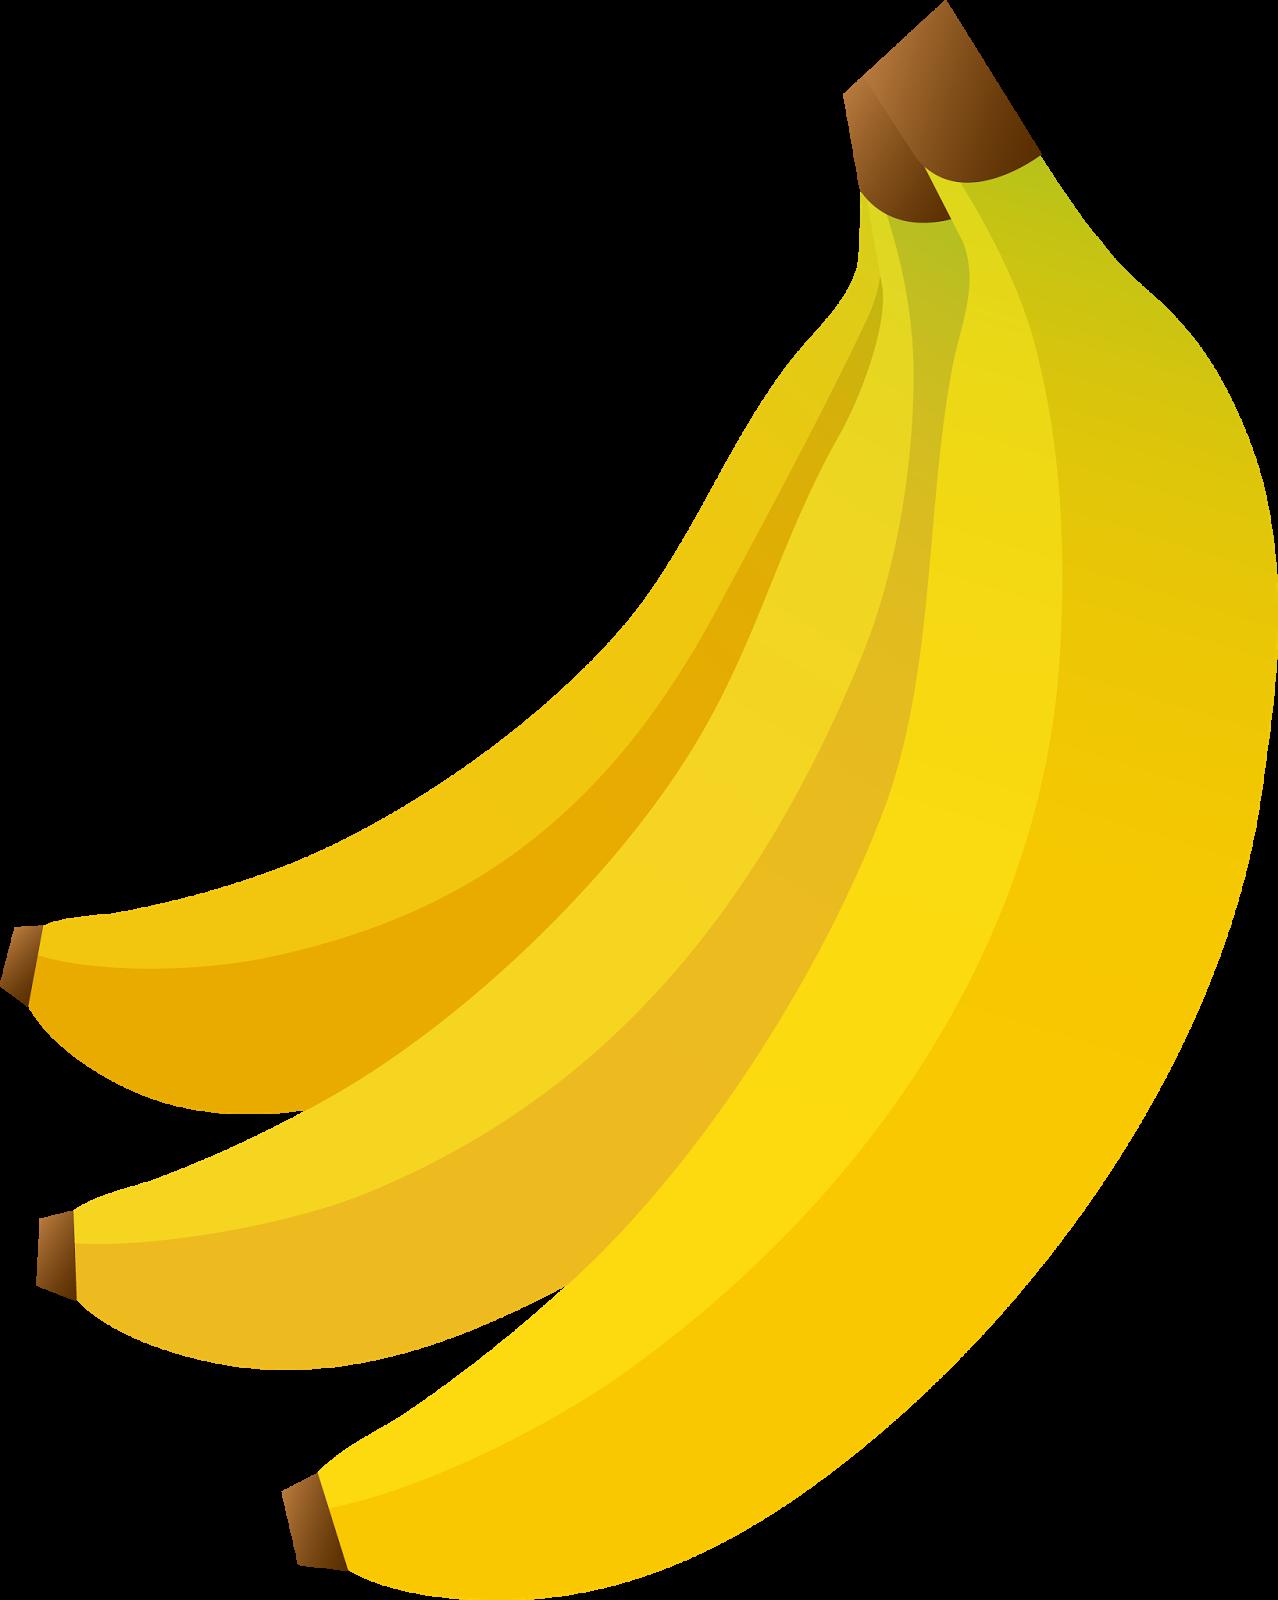 clip art transparent stock Images of Banana Bunch Drawing